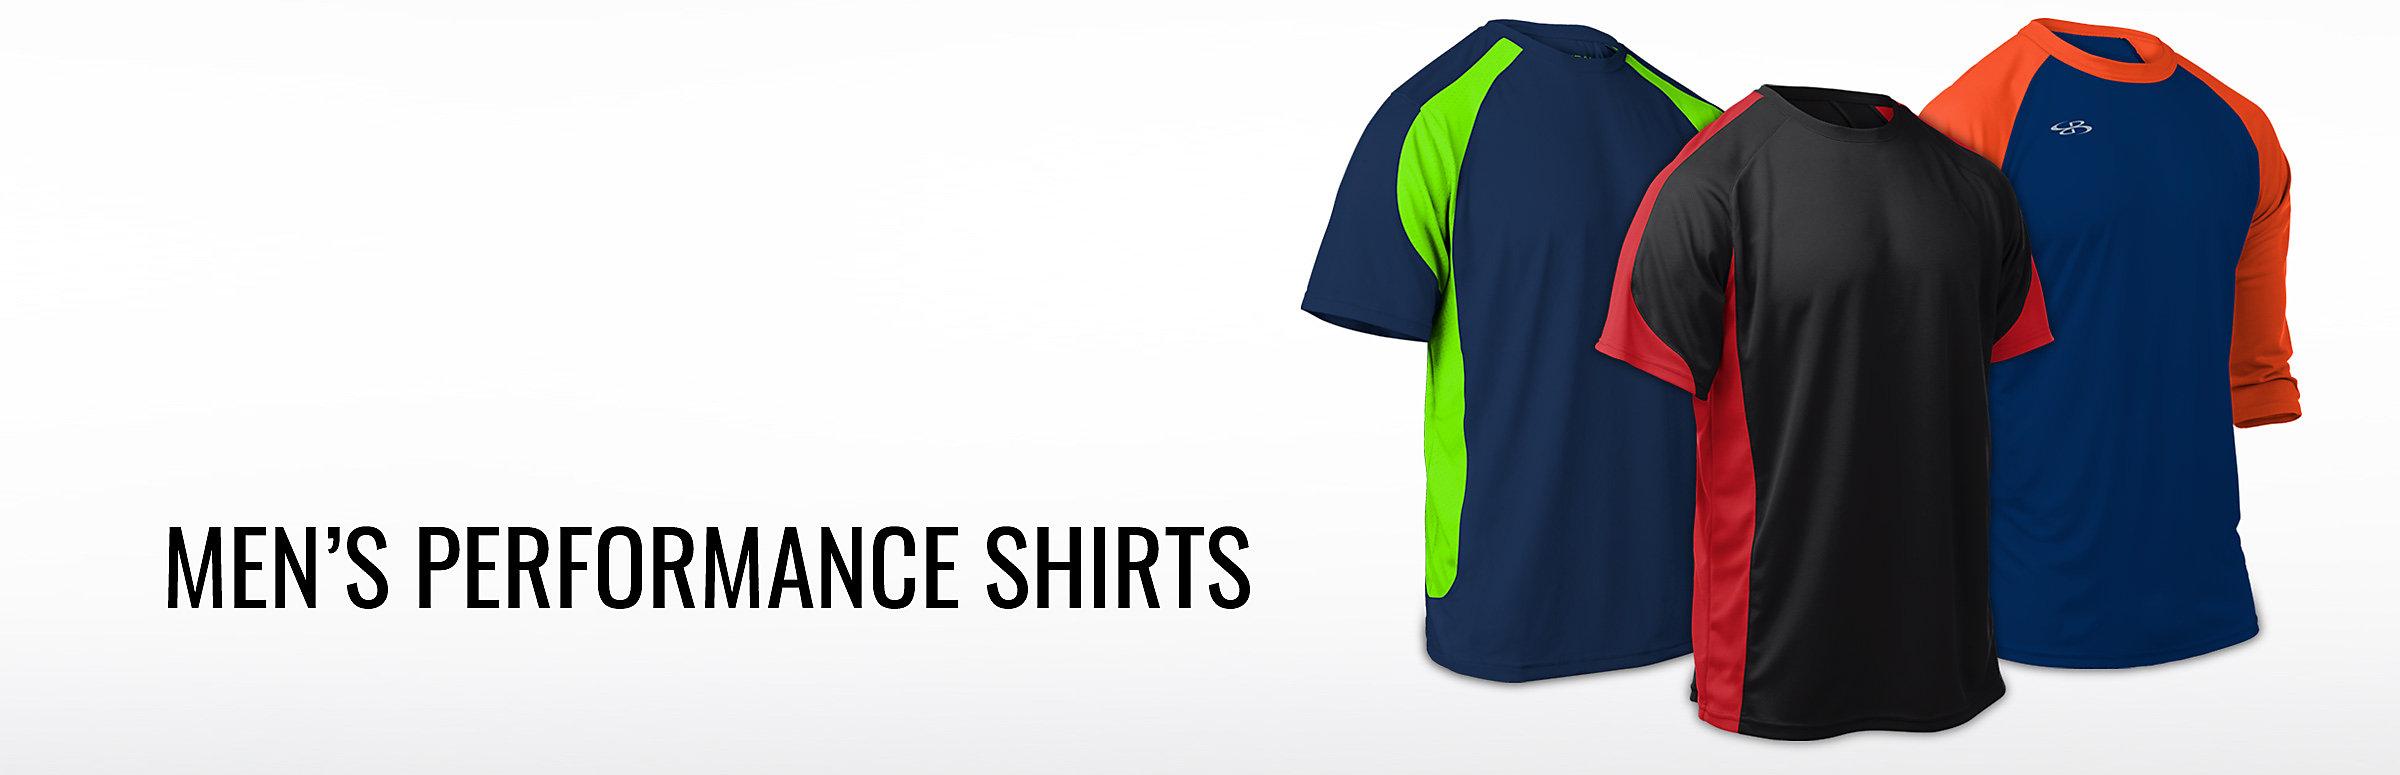 Mens Performance Shirts Boombah